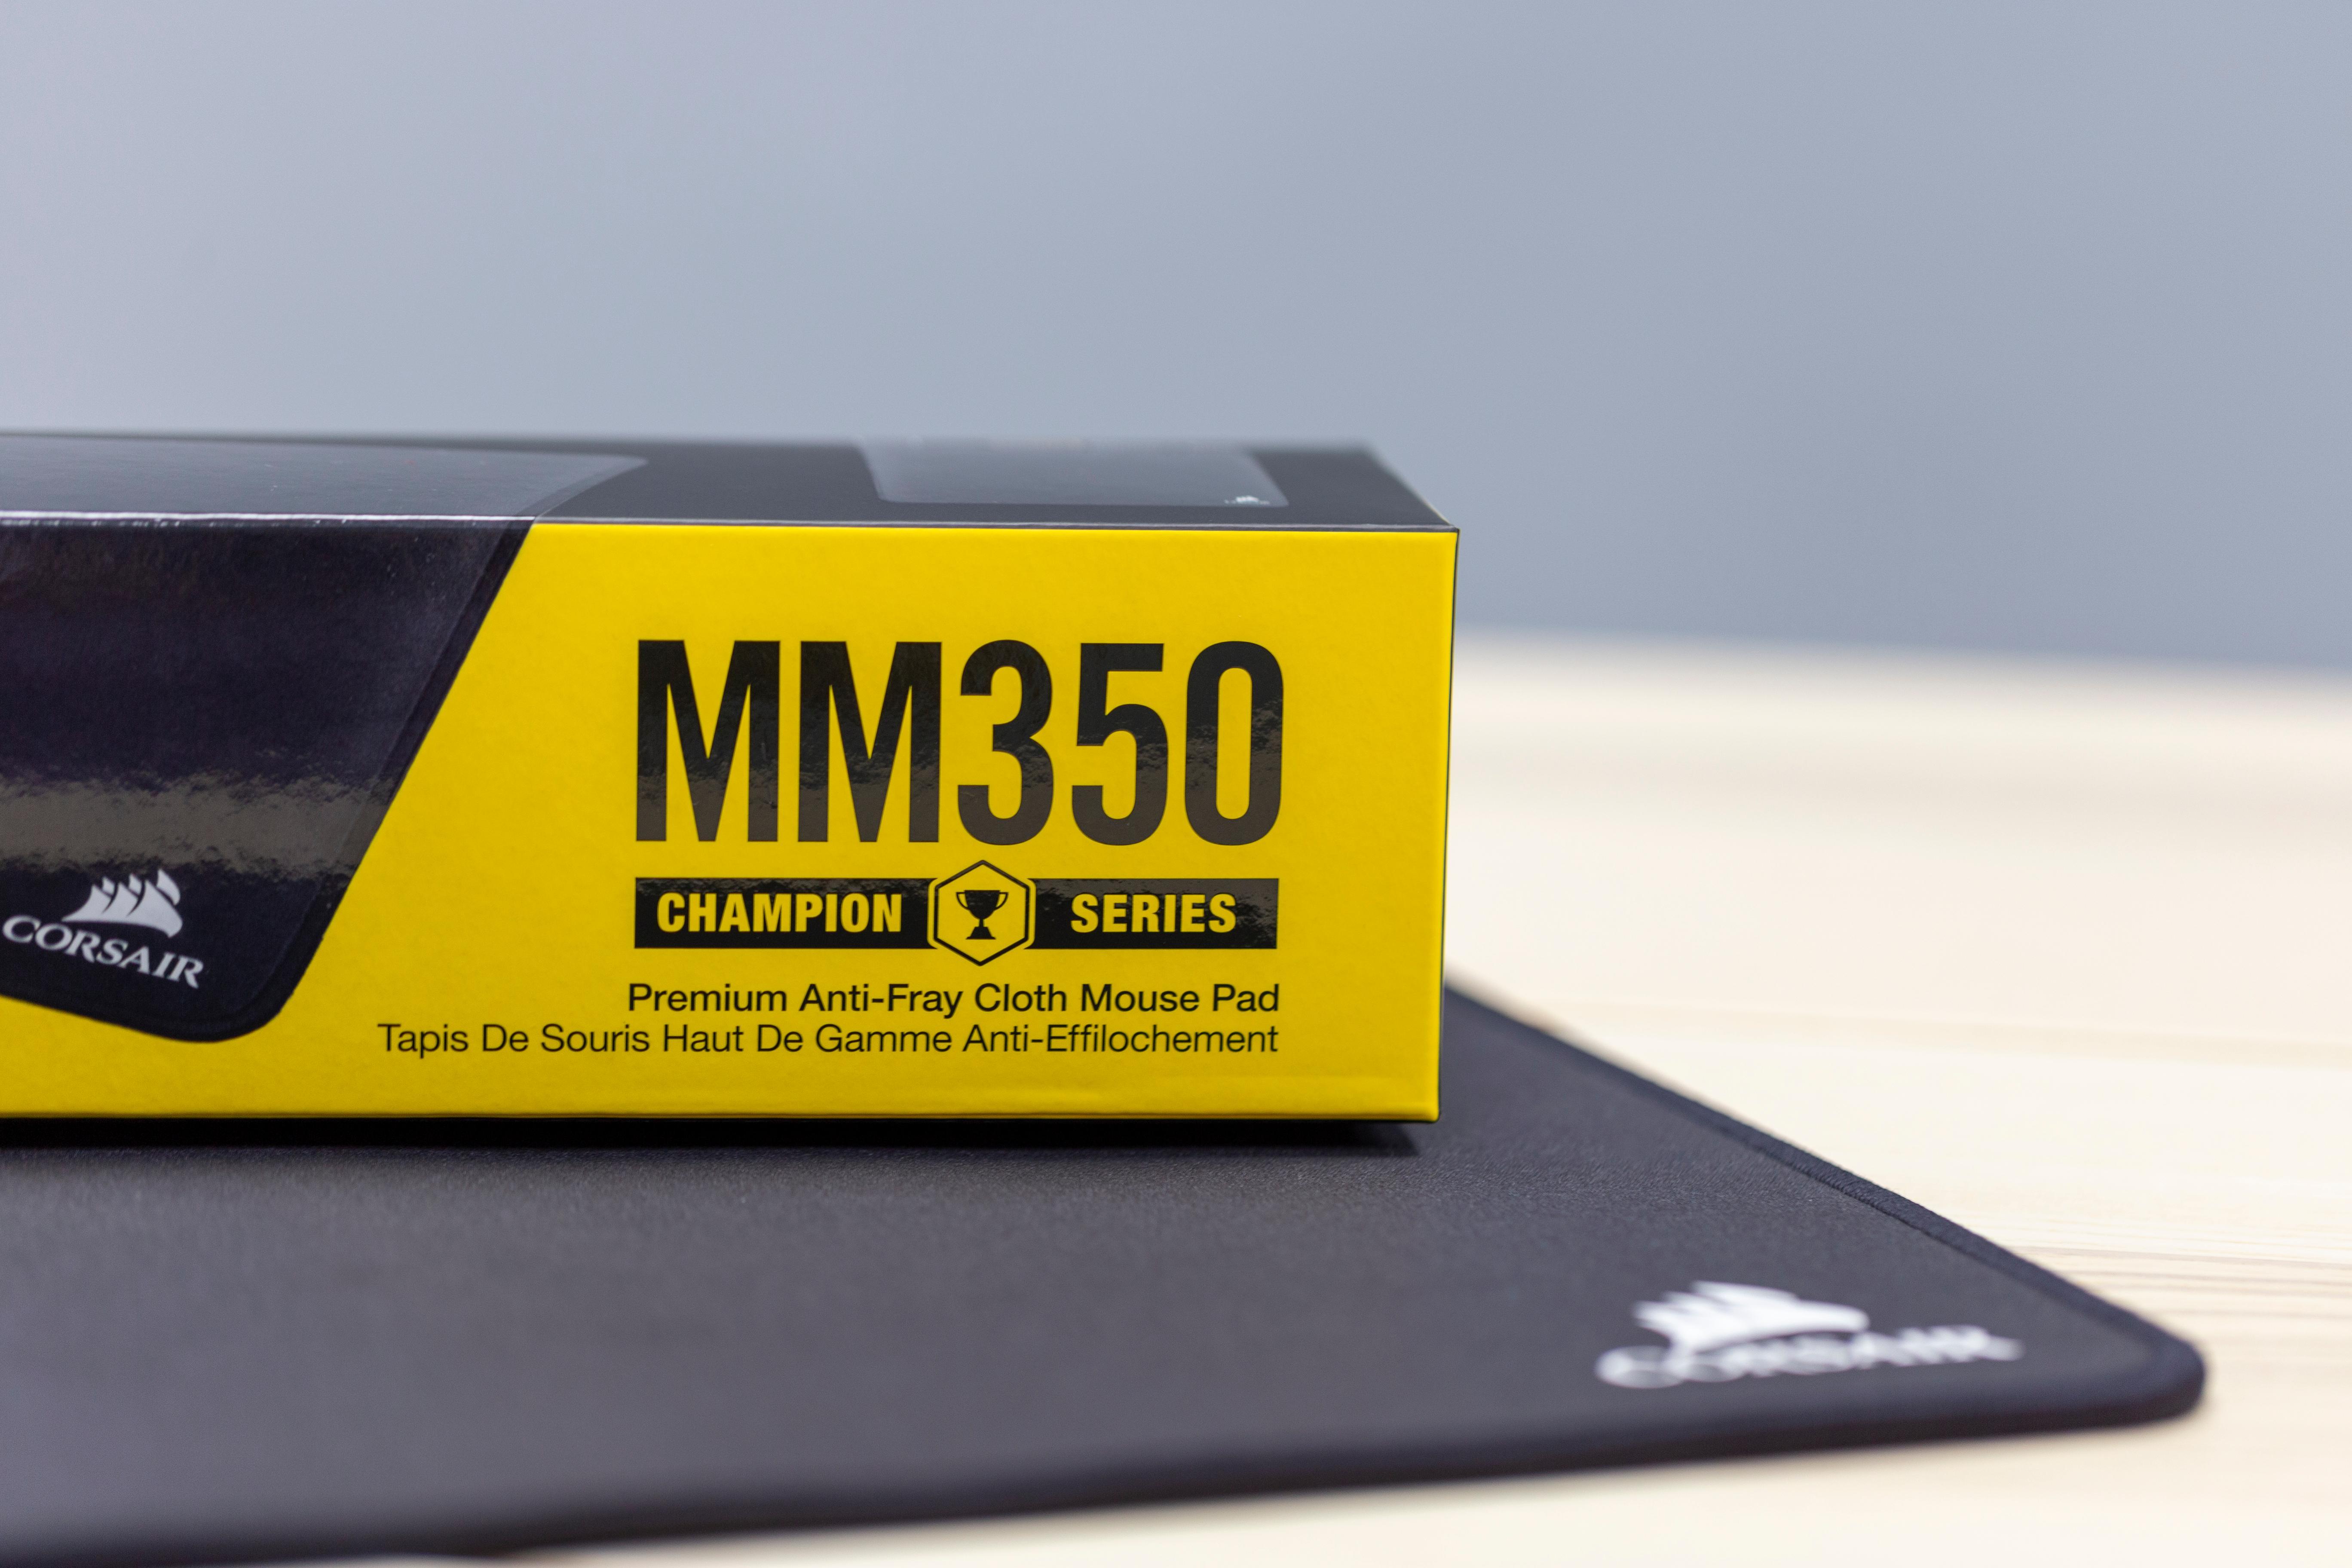 CORSAIR MM350